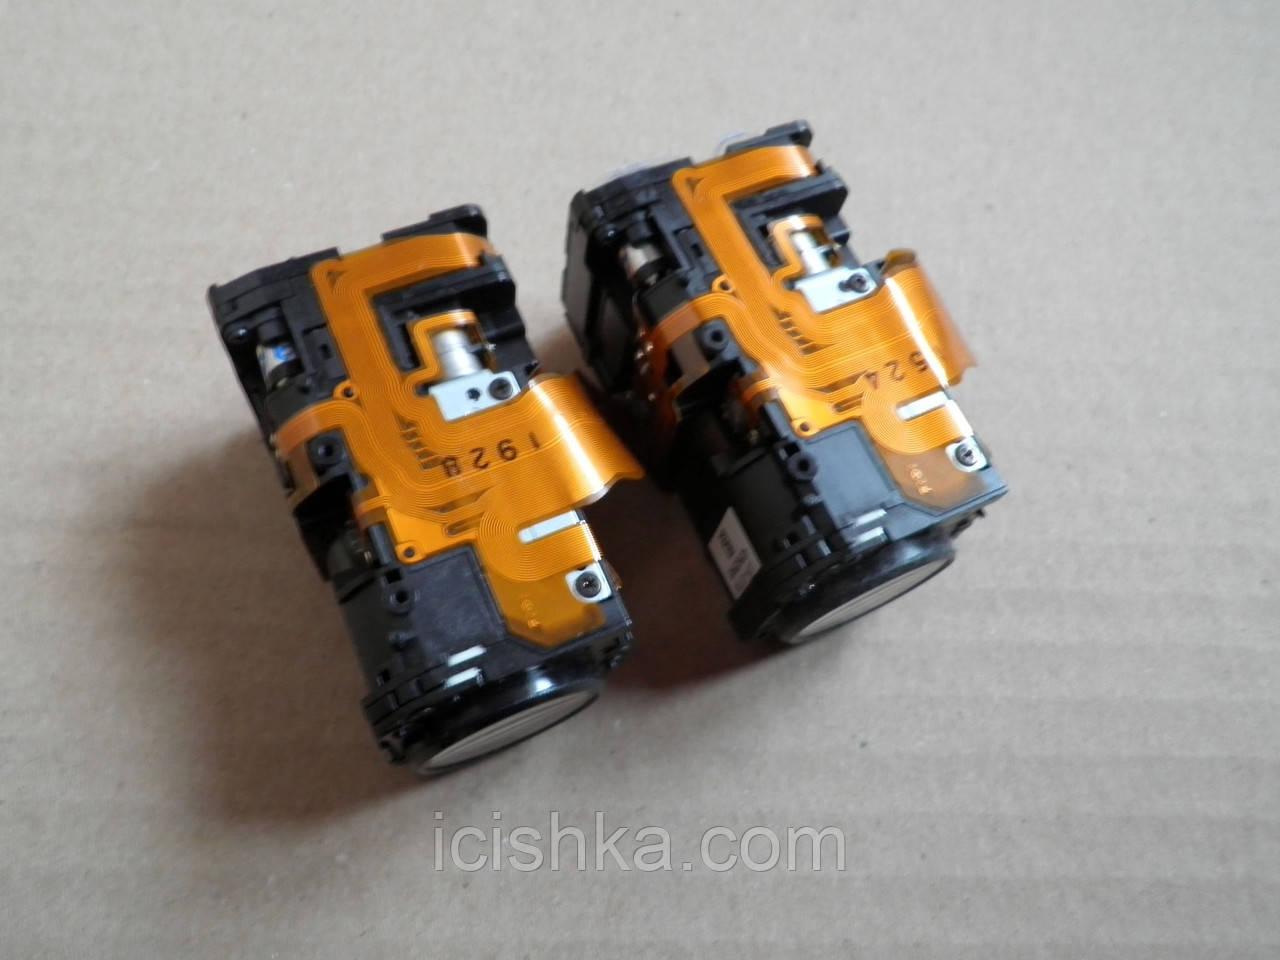 Объектив ЗУМ ZOOM Sony LSV-1270A (HDR-SR11E SR12E CX11E CX12E)